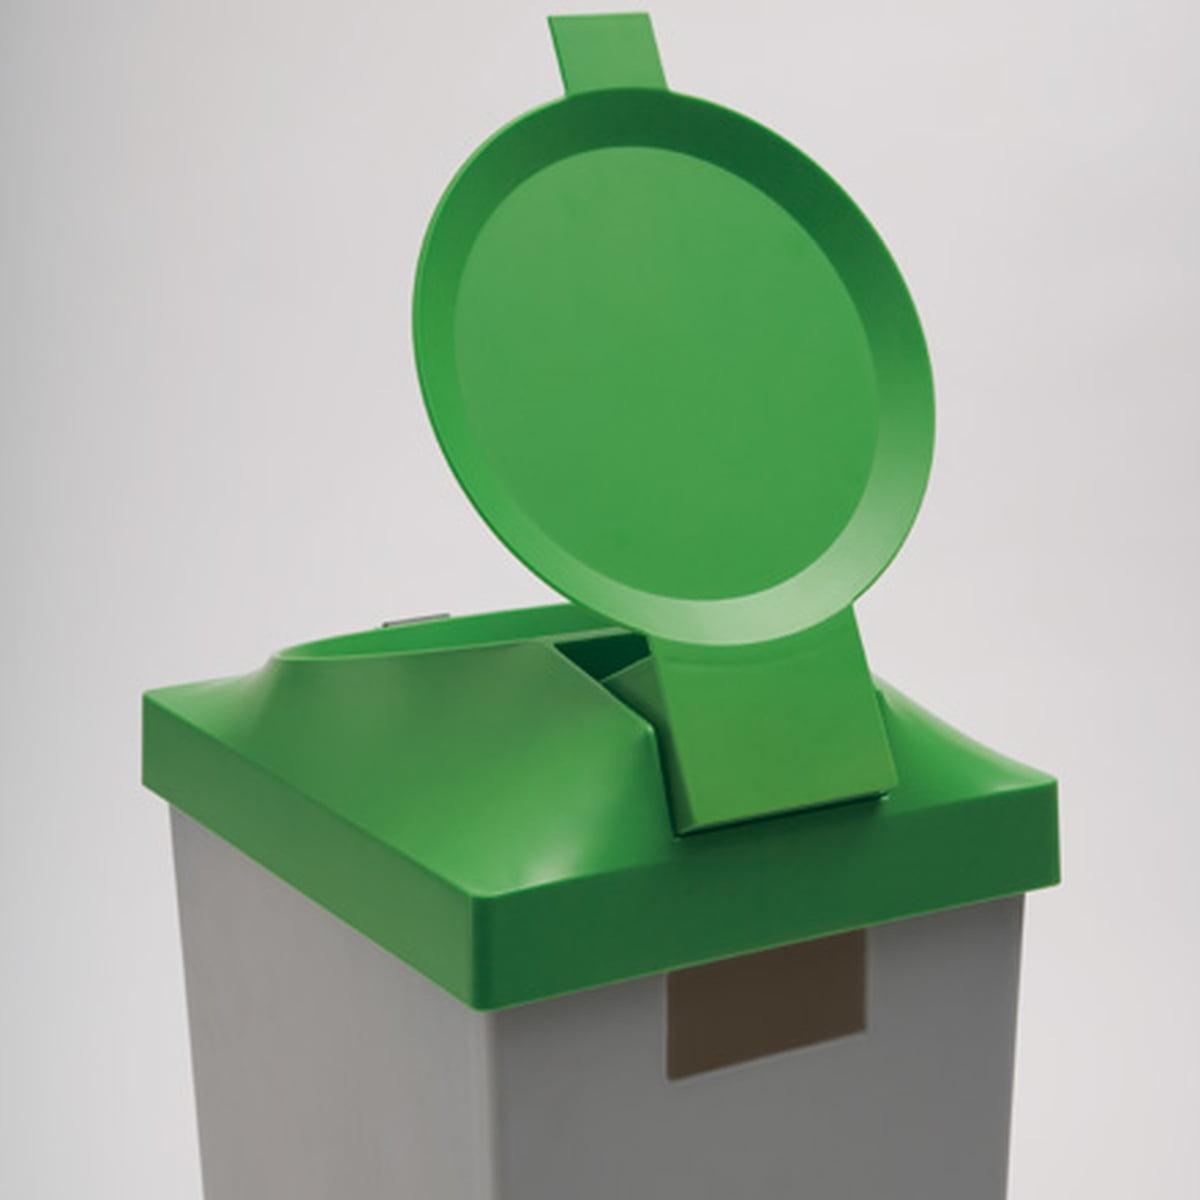 Top waste system authentics connox shop for Connox com